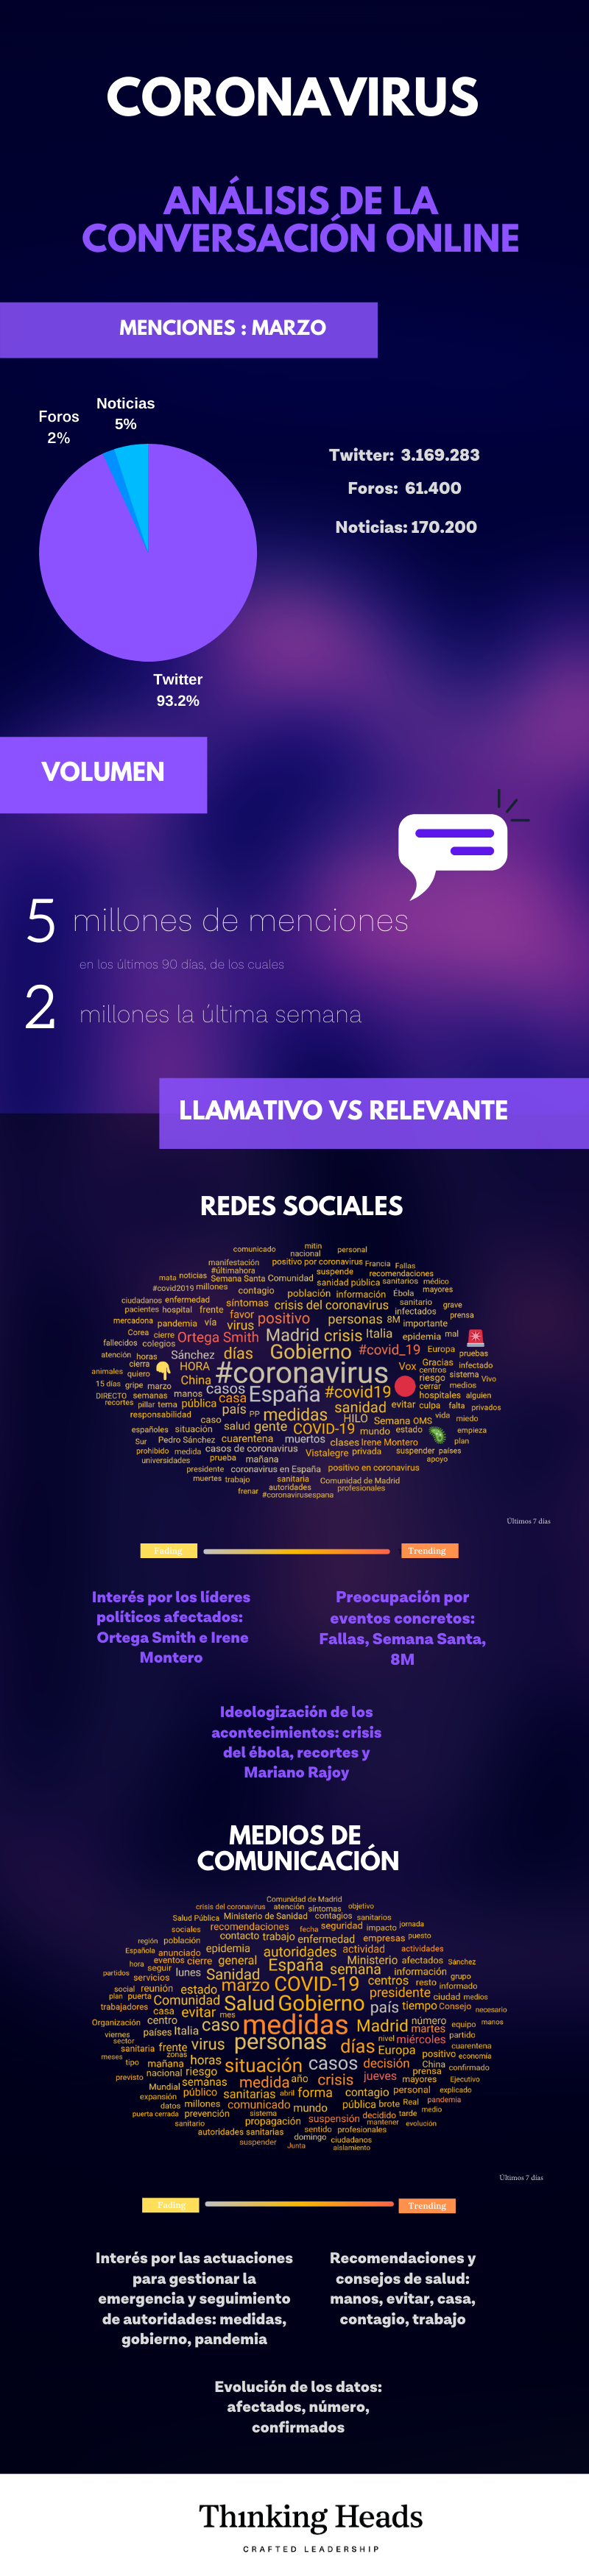 analisis-coronavirus-conversacion-digital-thinking-heads